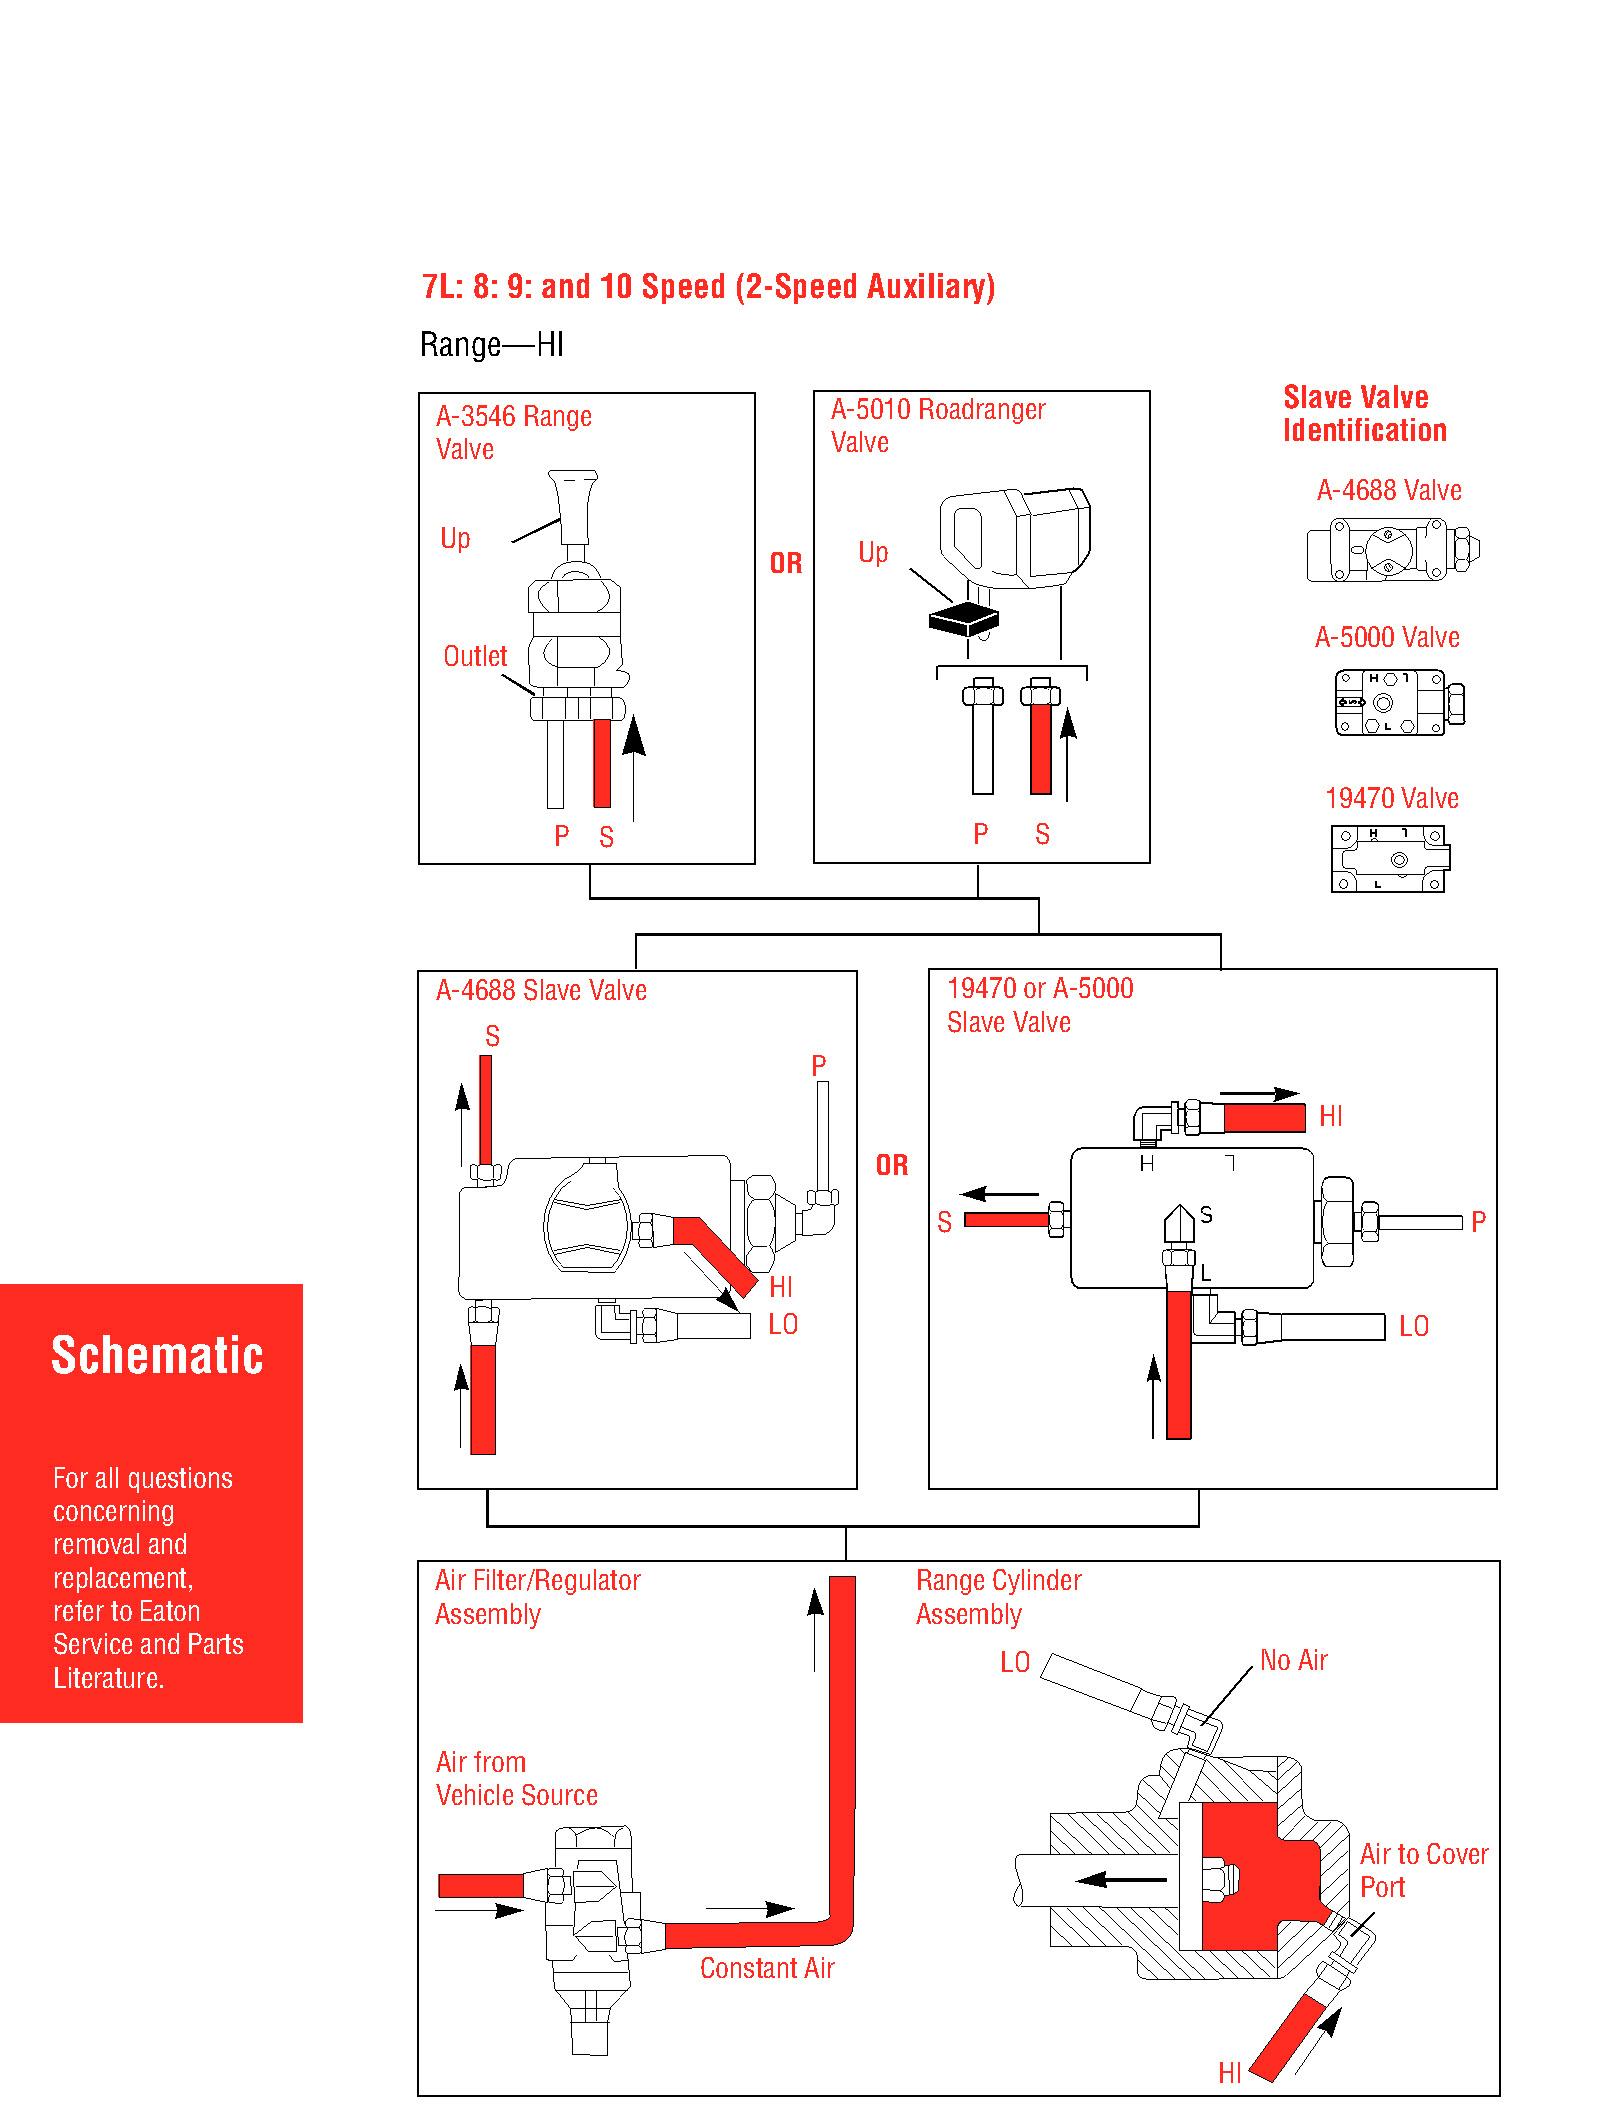 Dashboard Diagram 1996 Freightliner Fl70 Books Of Wiring Frightliner Fl80 Fuse Box Standard Transmission Looking For